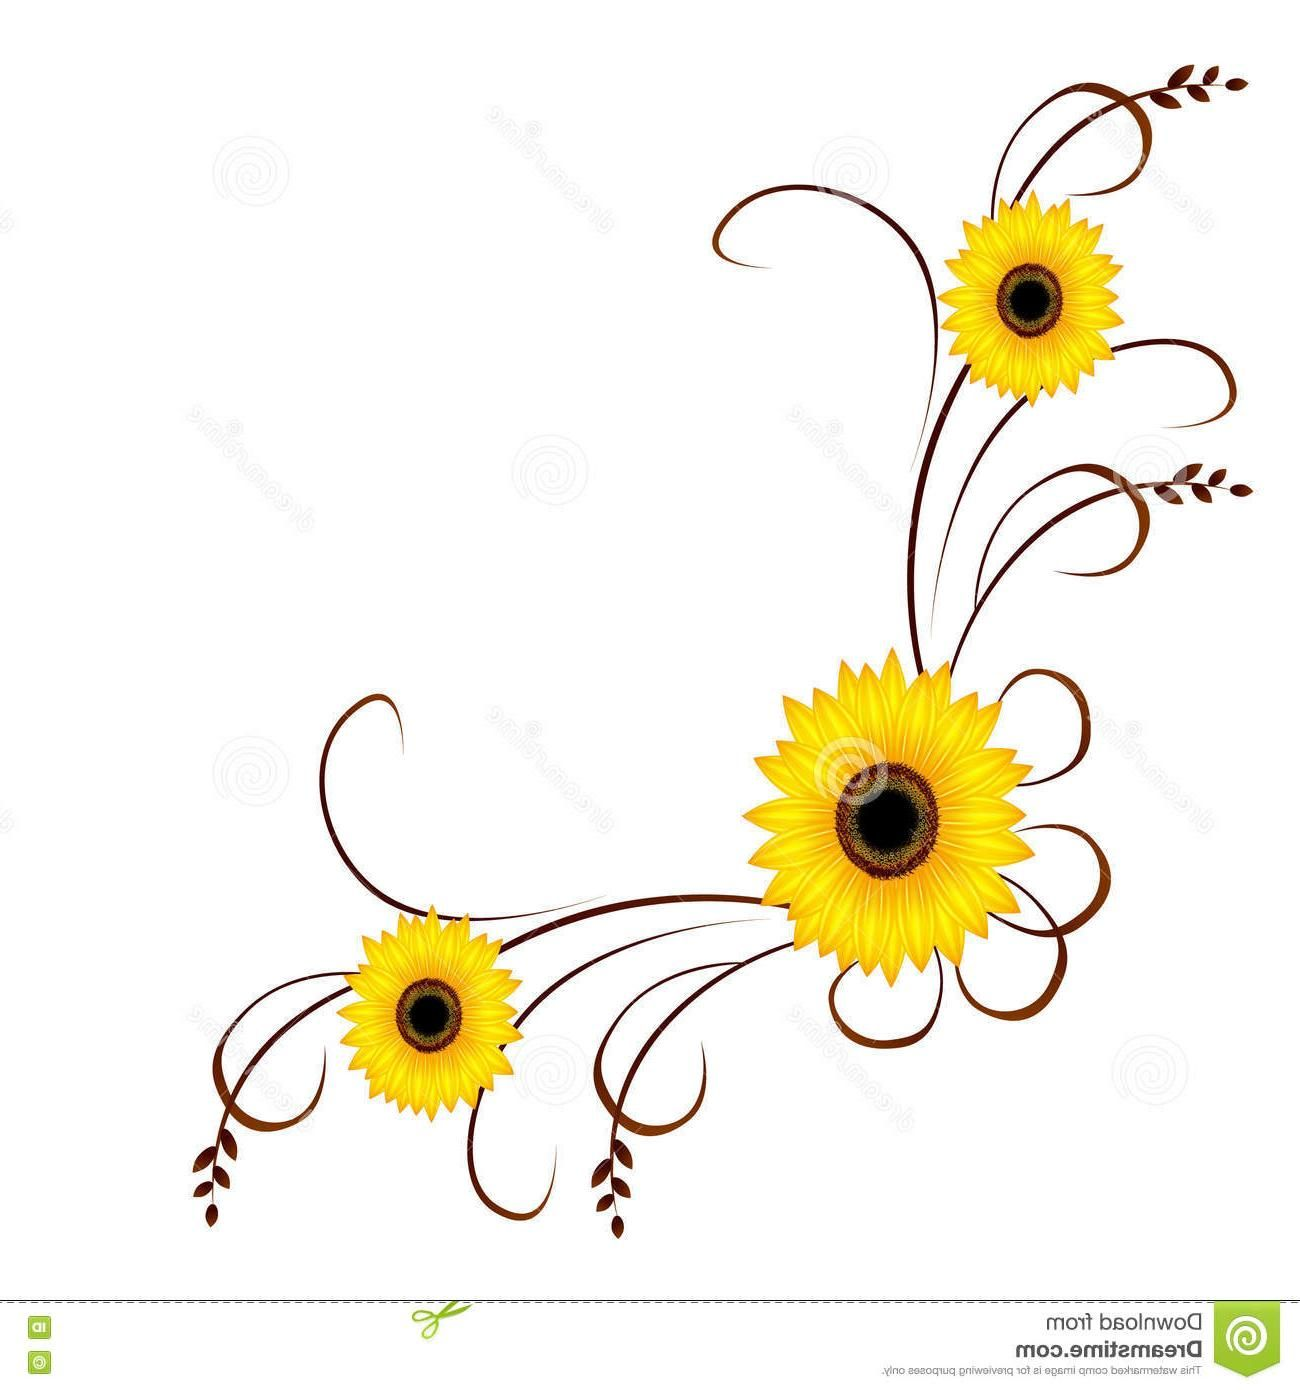 Best Sunflower Corner Border Vector Yellow Flower Unique Ornament Sunflowers White Unique Ornament Corner Borders Yellow Flowers